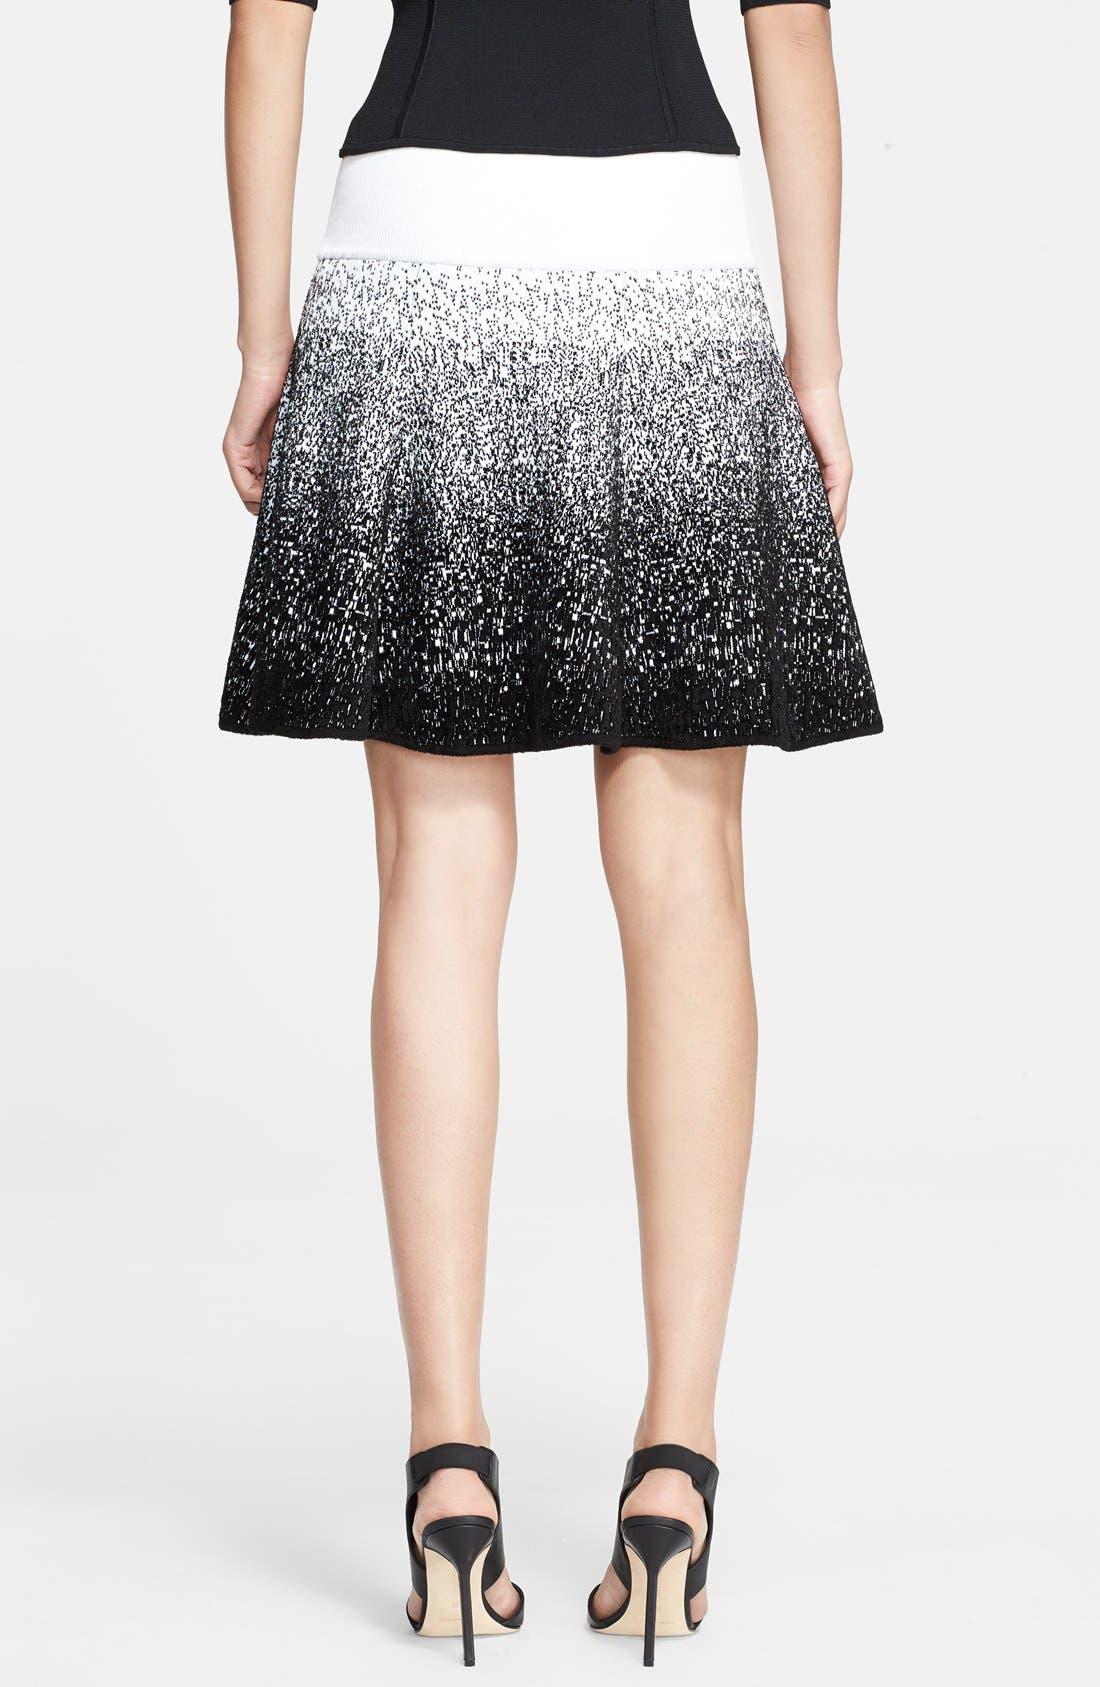 A.L.C., Chenille Flared Skirt, Alternate thumbnail 2, color, 185